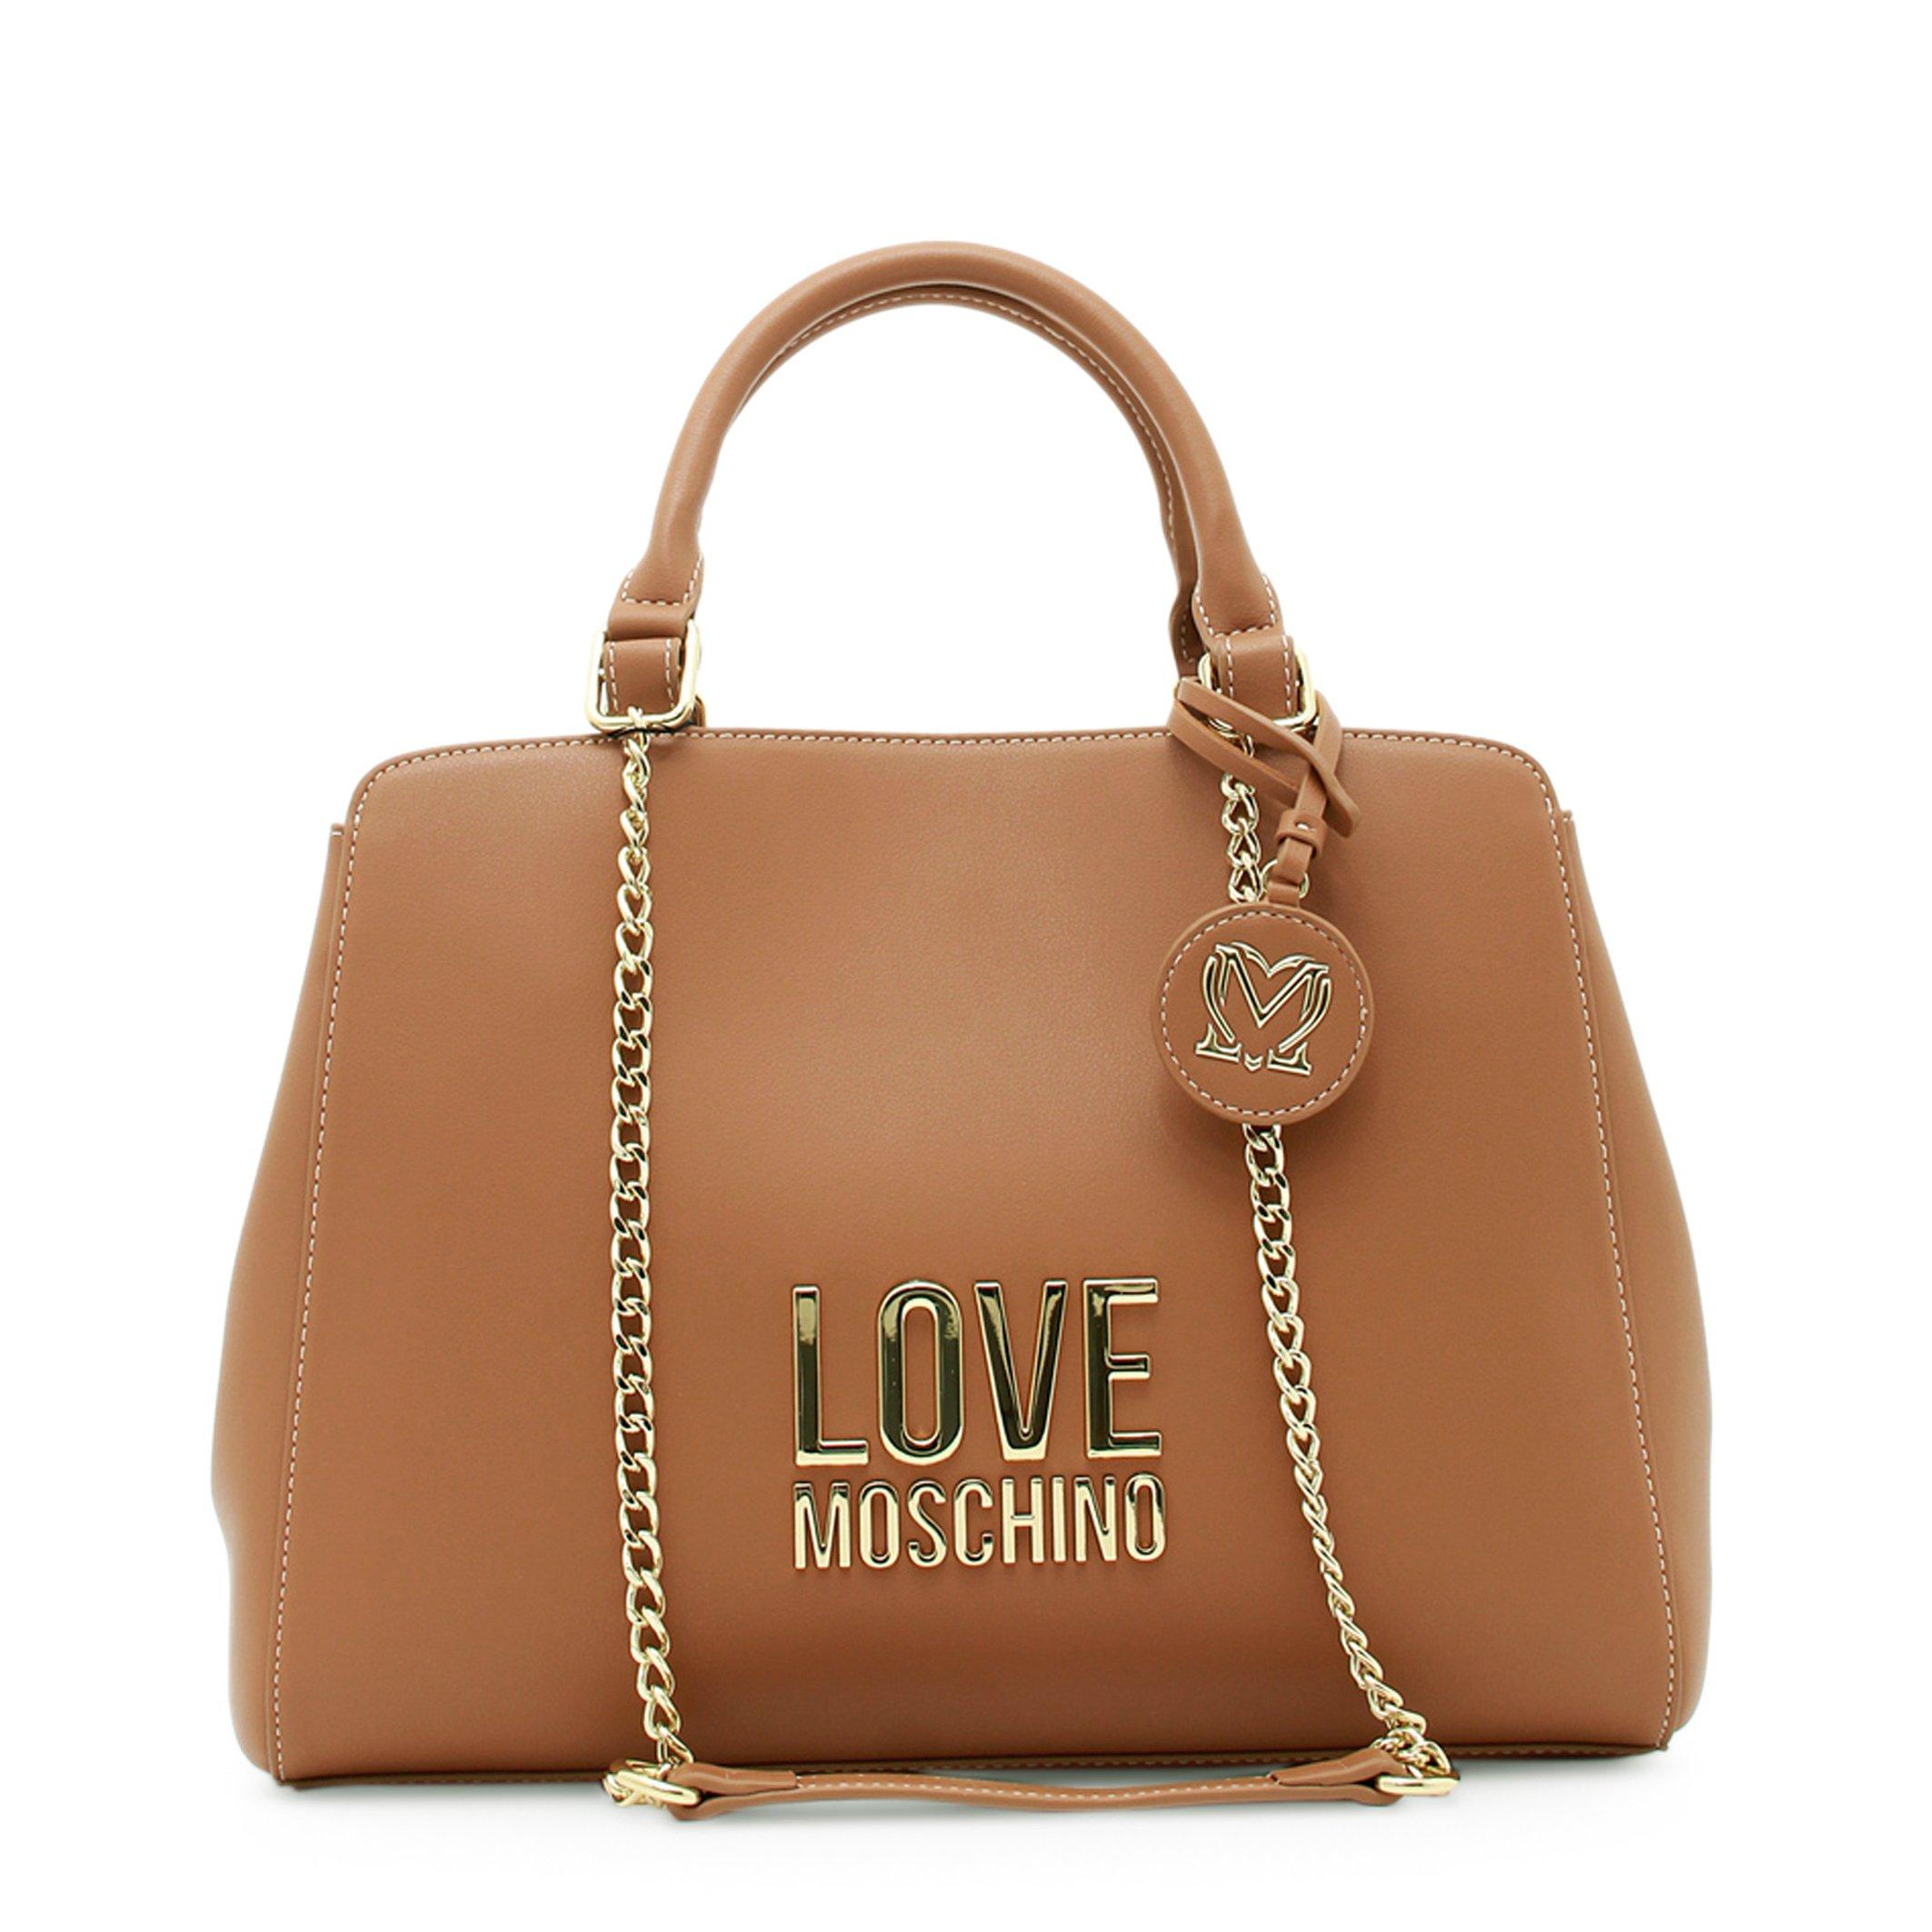 Love Moschino Women's Shoulder Bag Various Colours JC4192PP1DLJ0 - brown NOSIZE